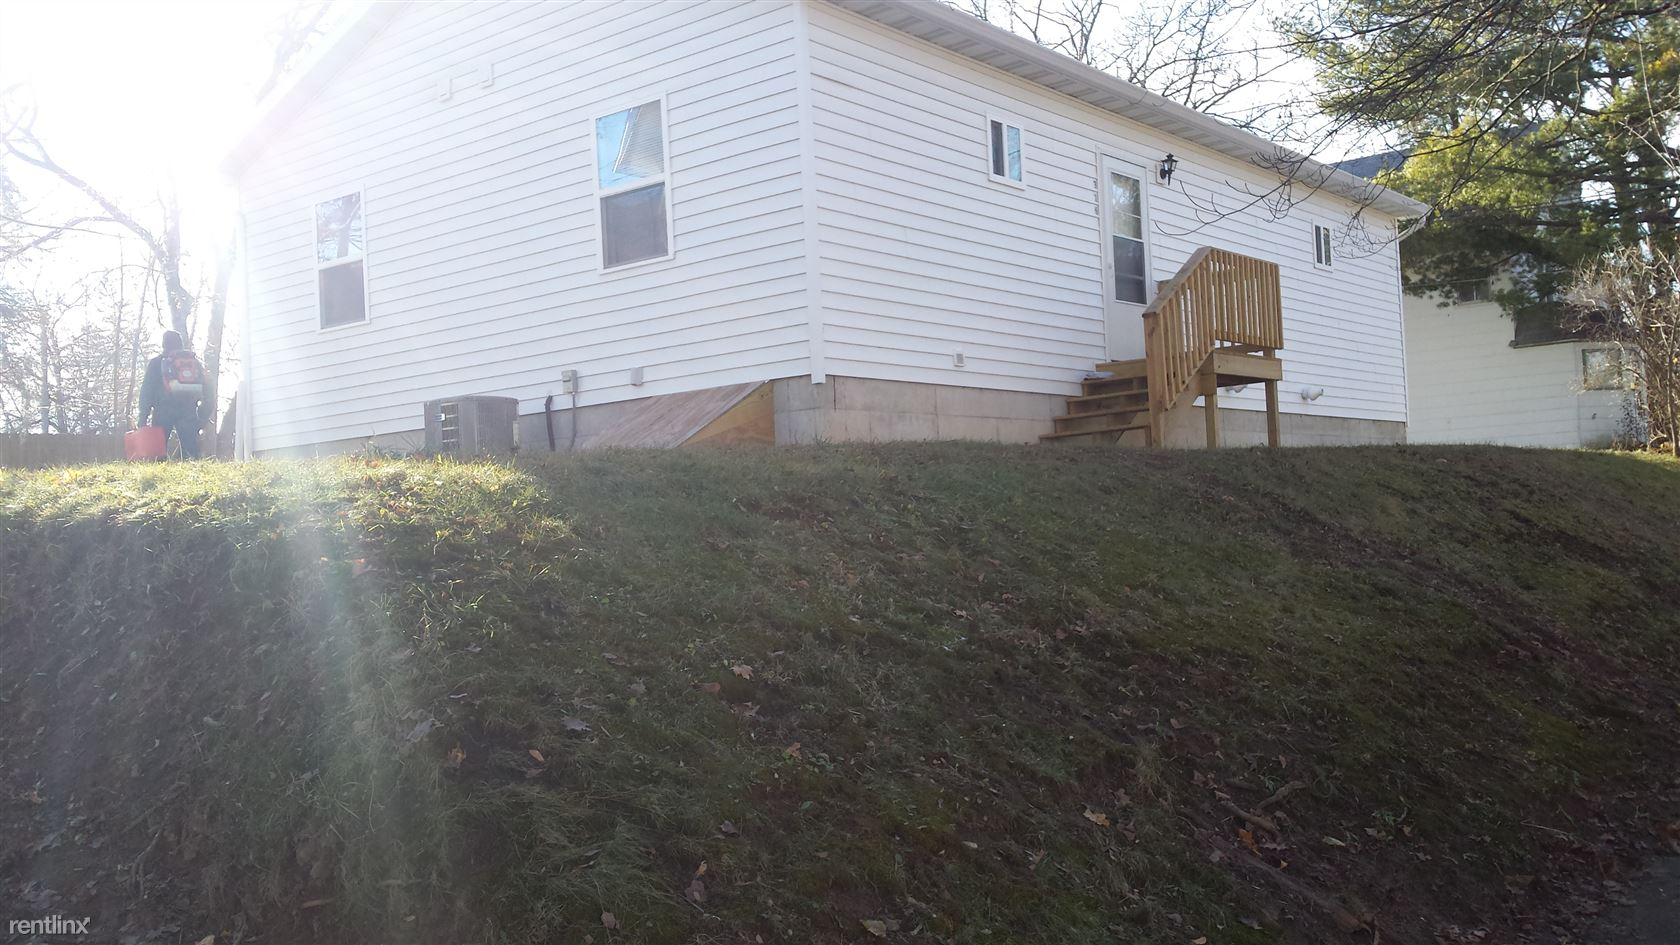 Room for Rent in Big Rapids